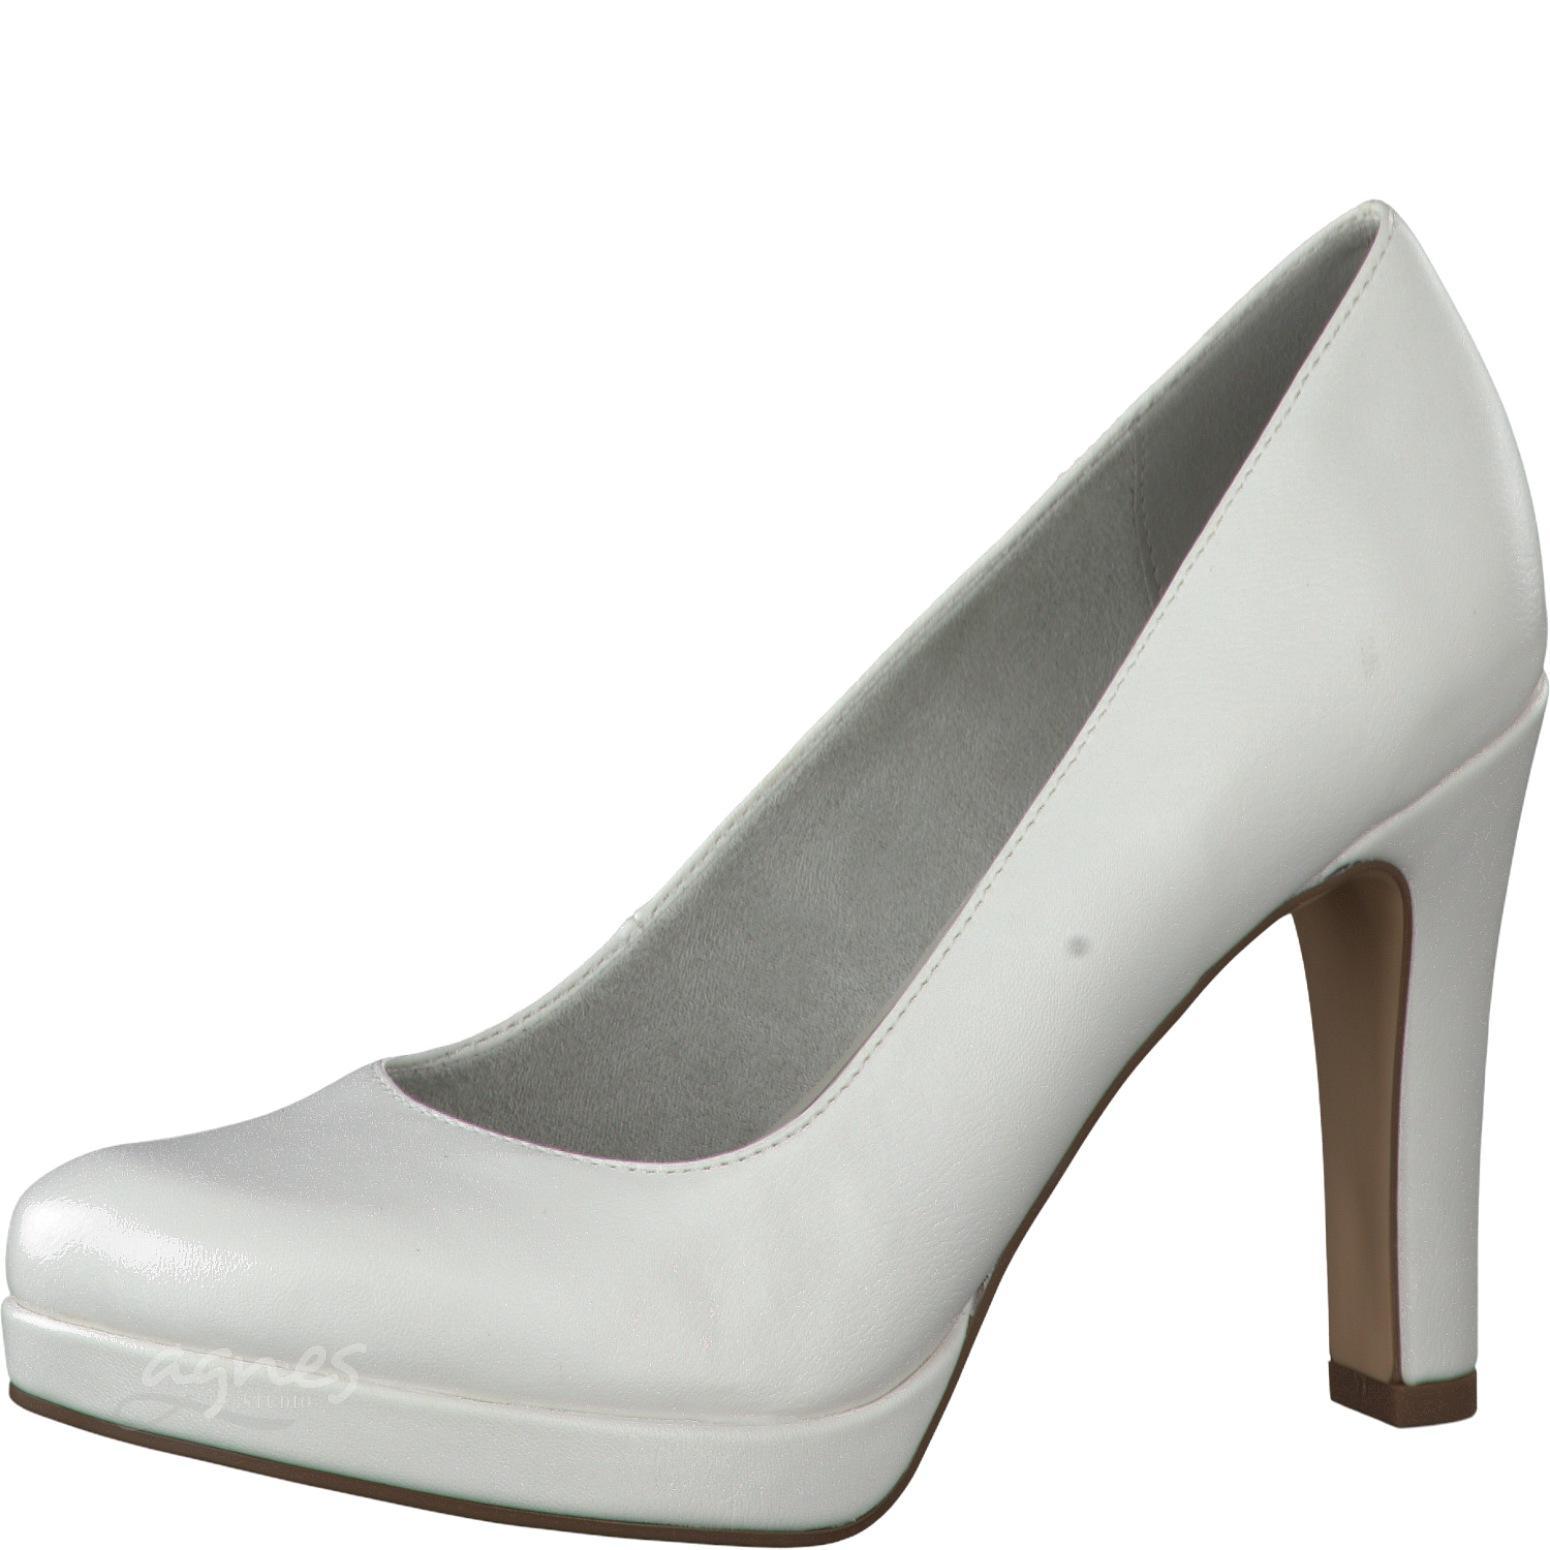 svatebni-obuv-tamaris-22426-studioagnes